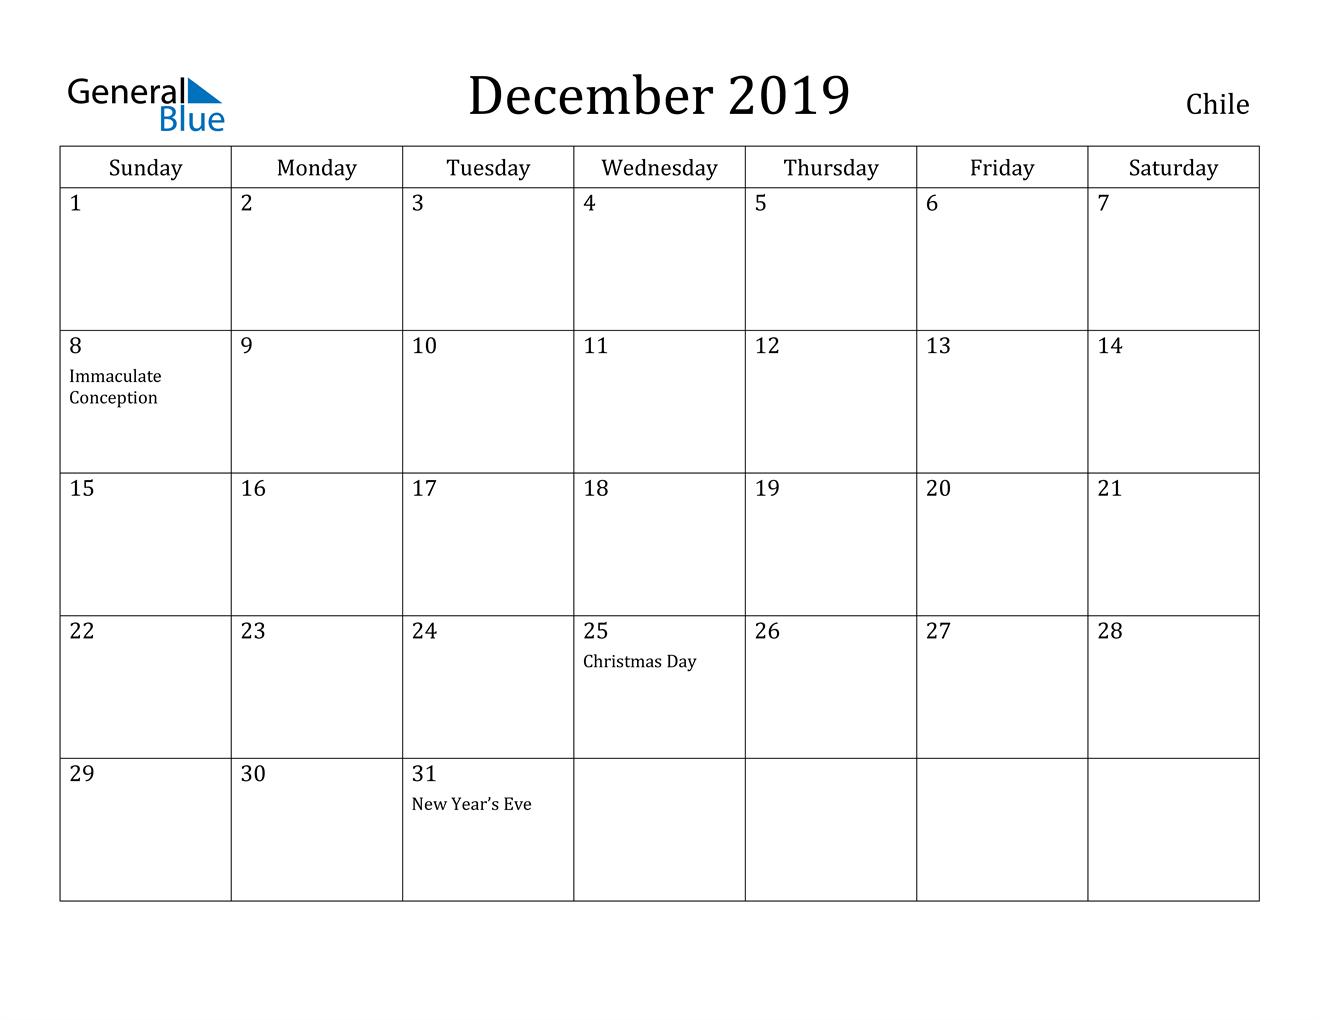 Image of December 2019 Chile Calendar with Holidays Calendar